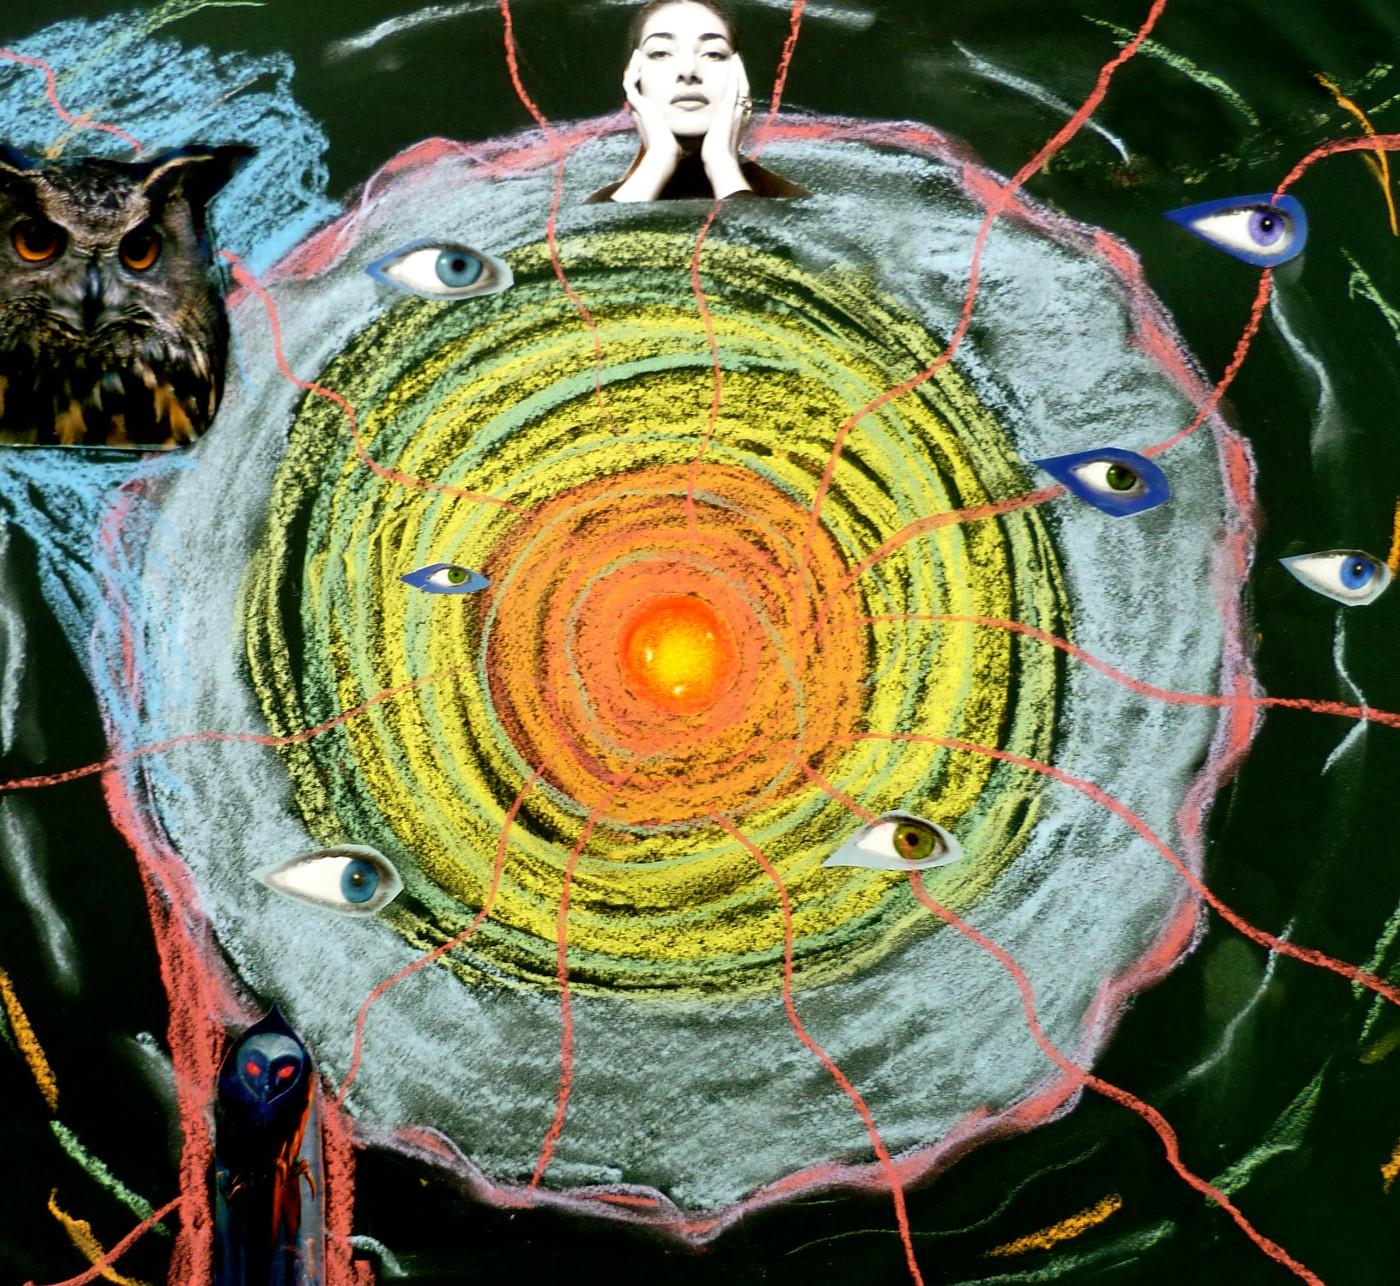 art-as-a-spiritual-guide-copy